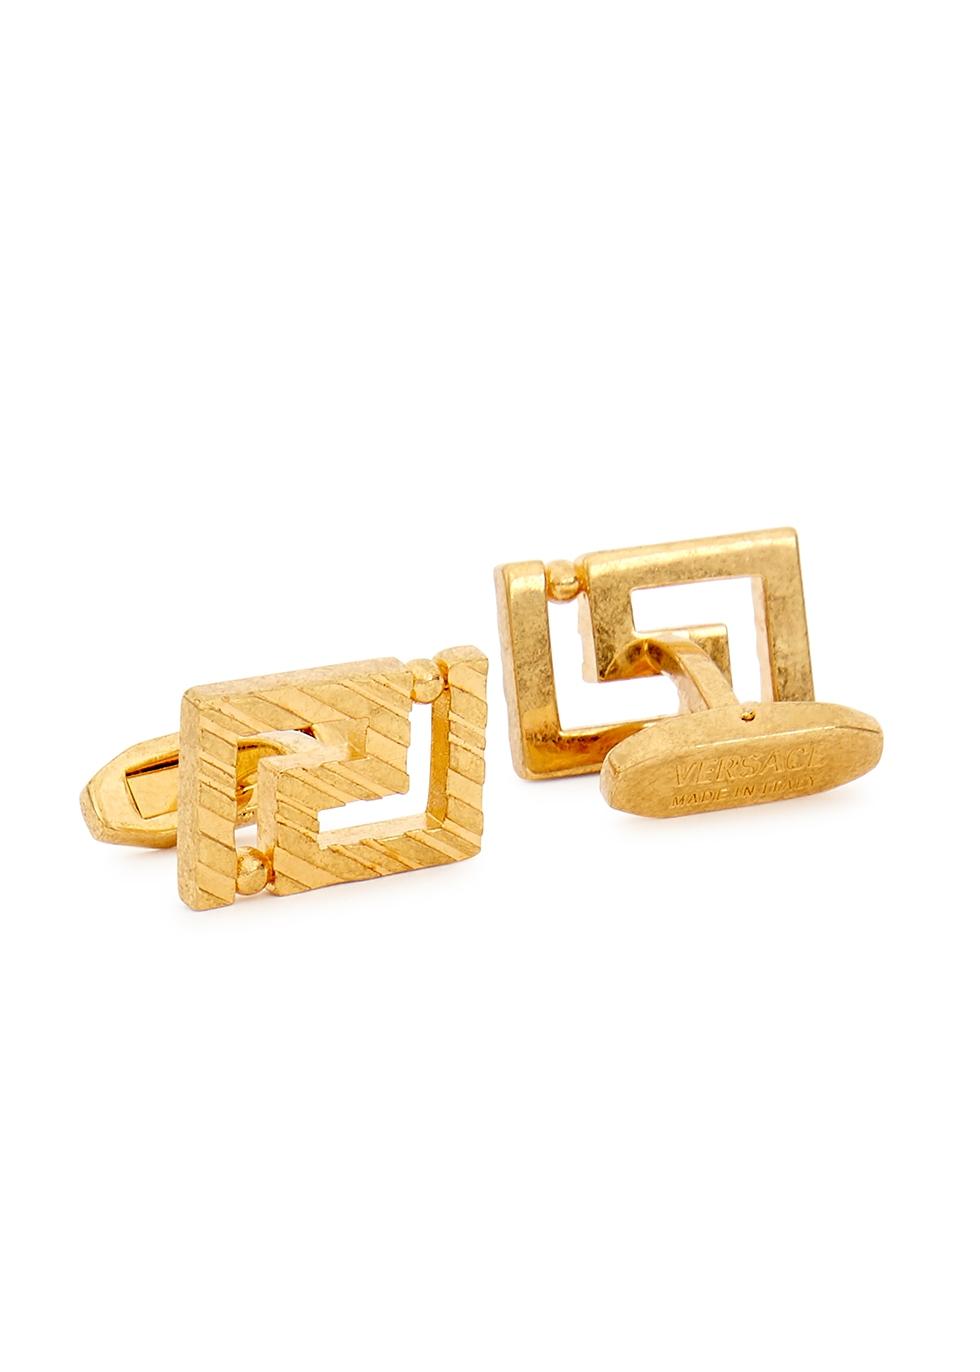 Greco gold-tone cufflinks